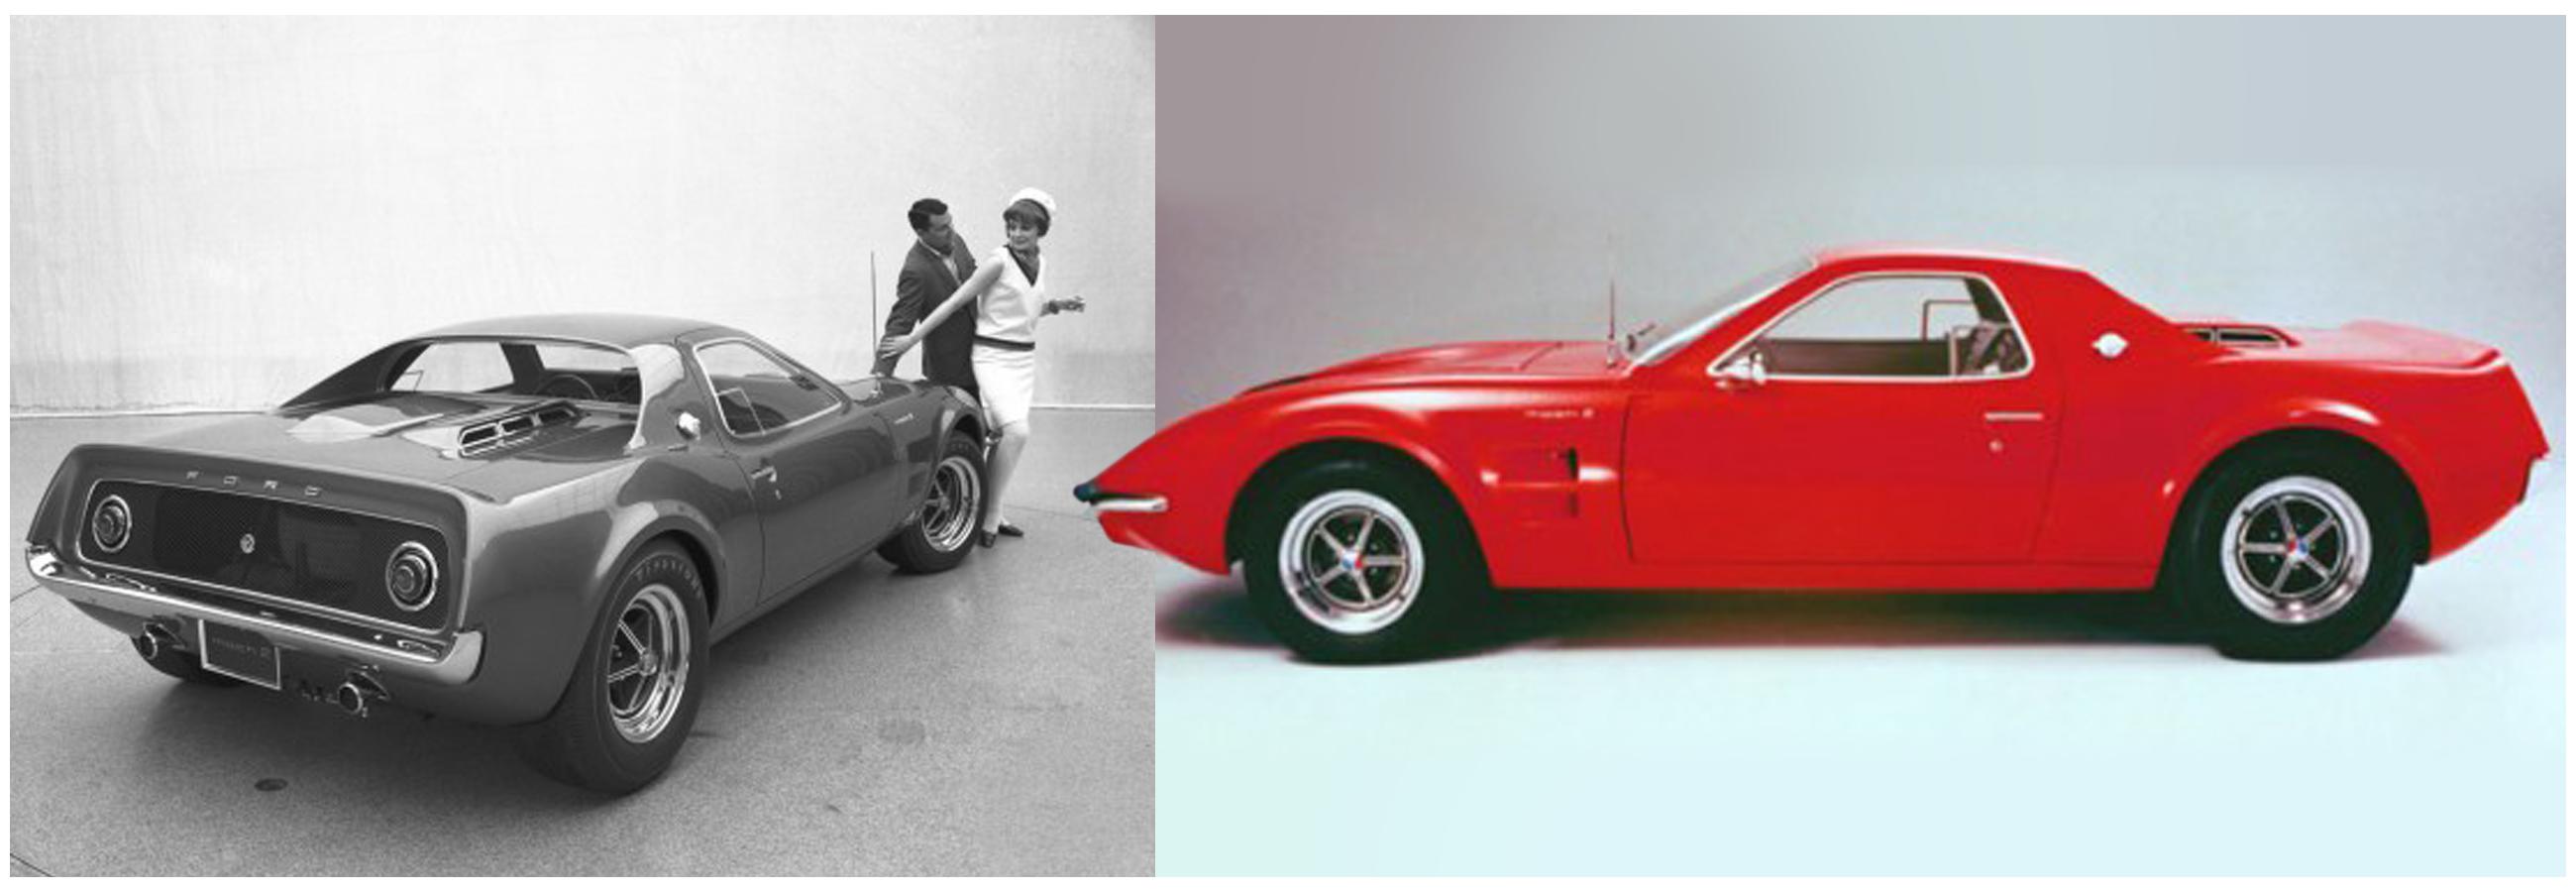 1967 Ford Mach 2 concept